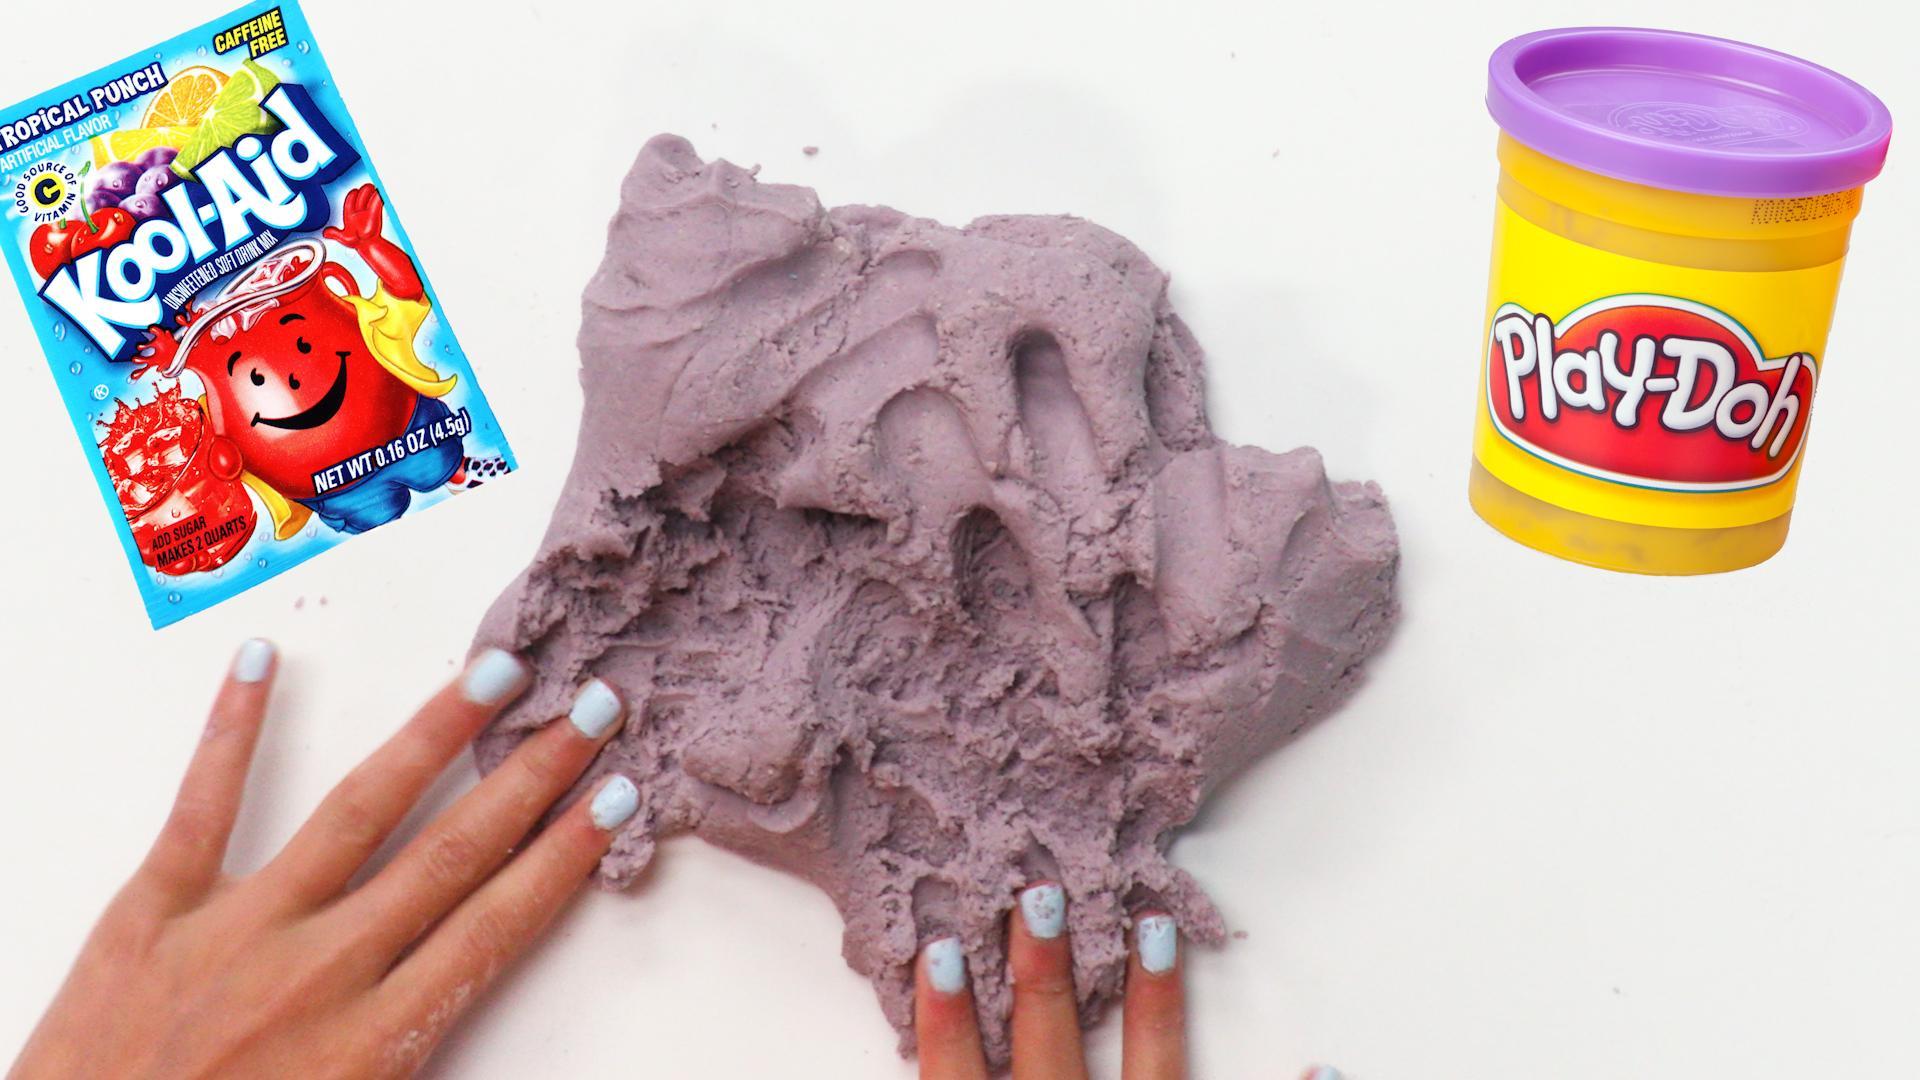 No-Cook Kool-Aid Playdough Recipe